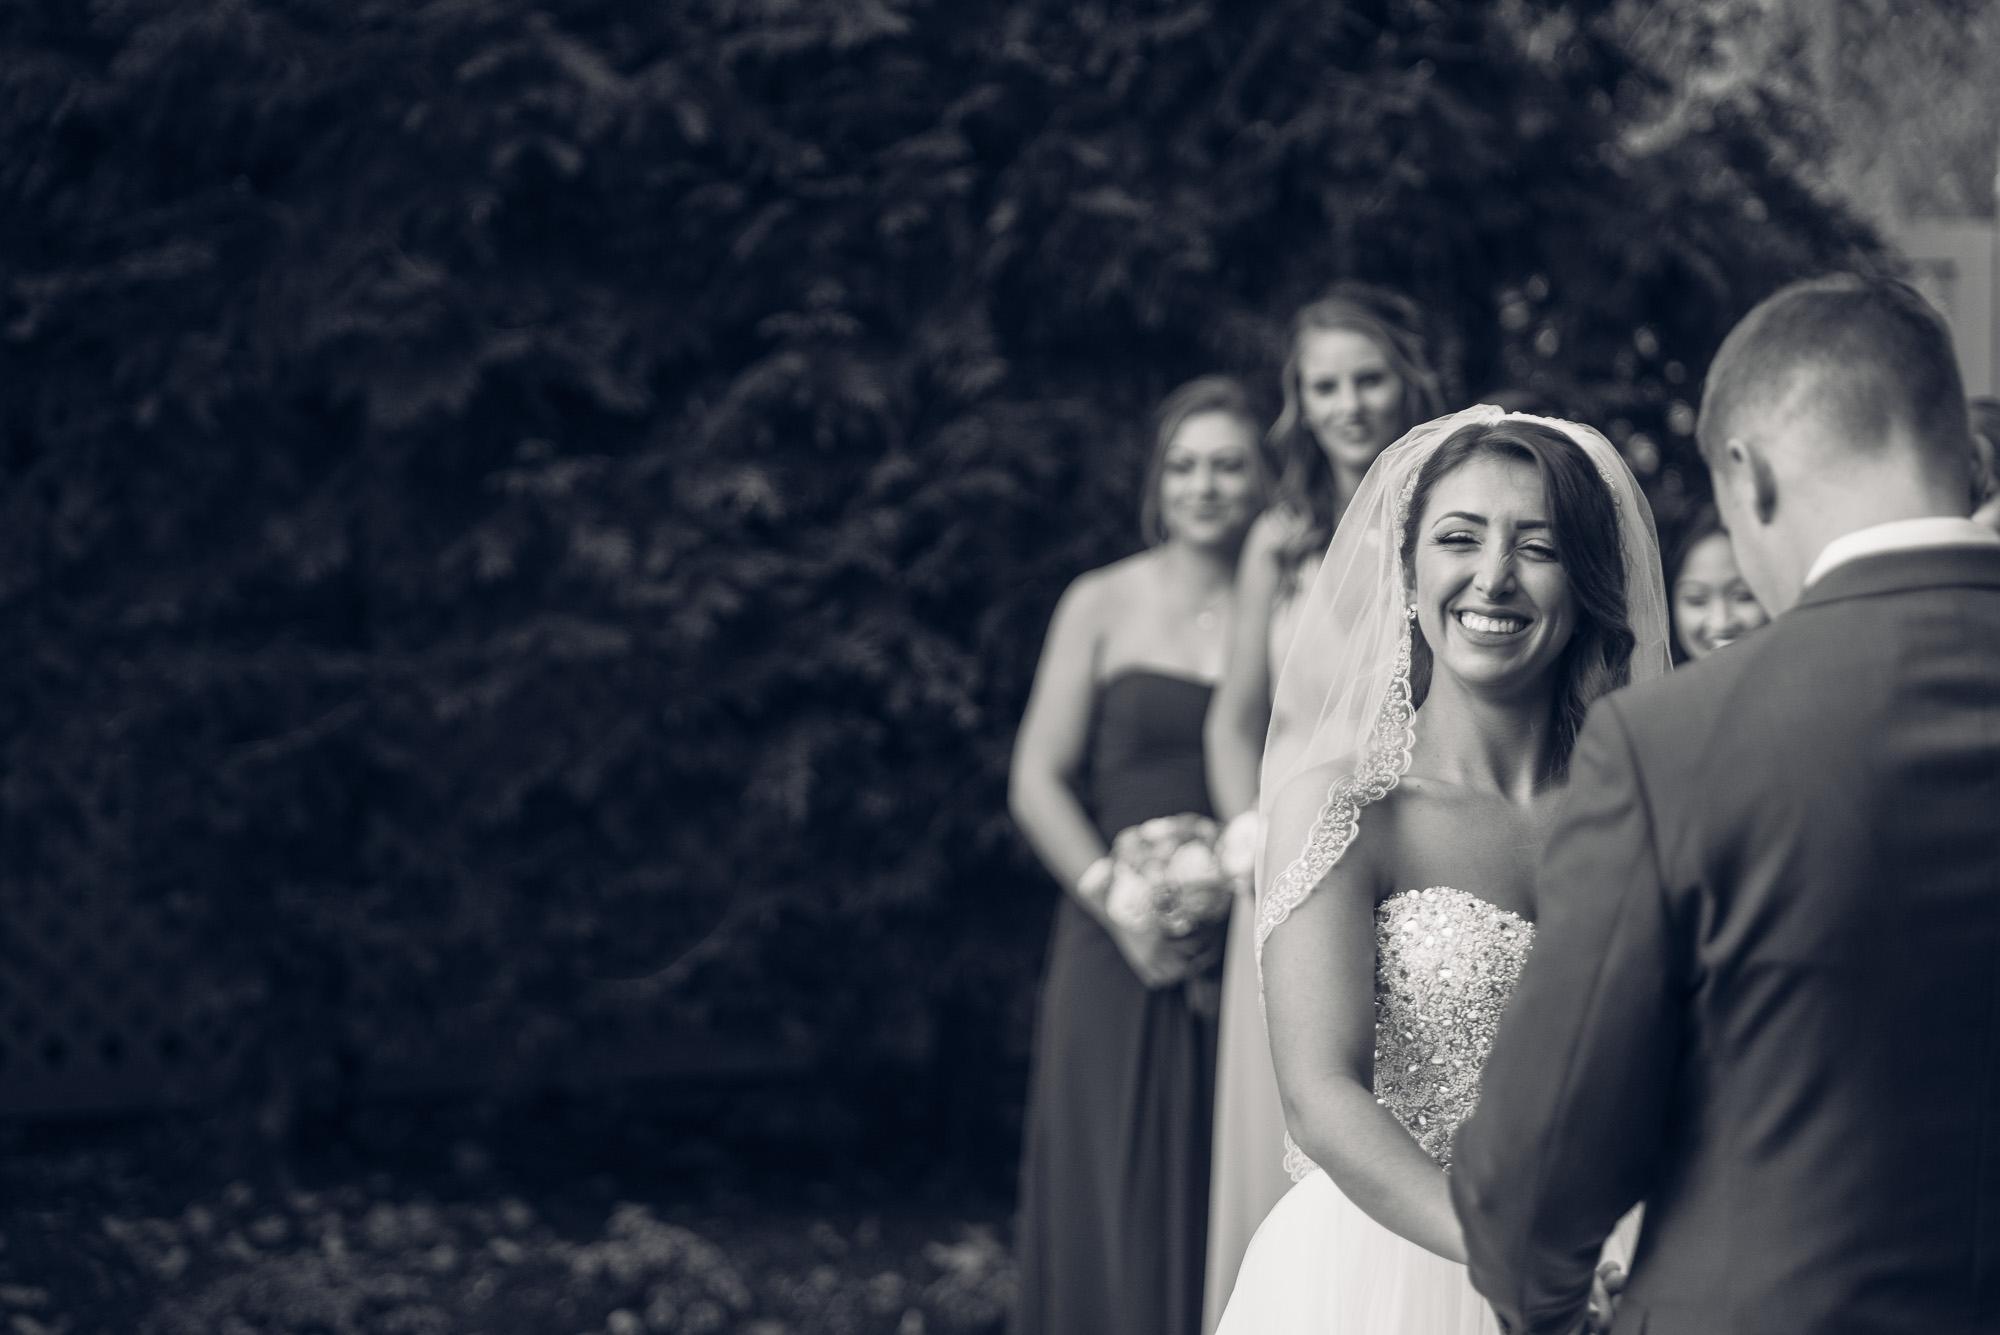 woodwinds_wedding_171020_web-33.jpg